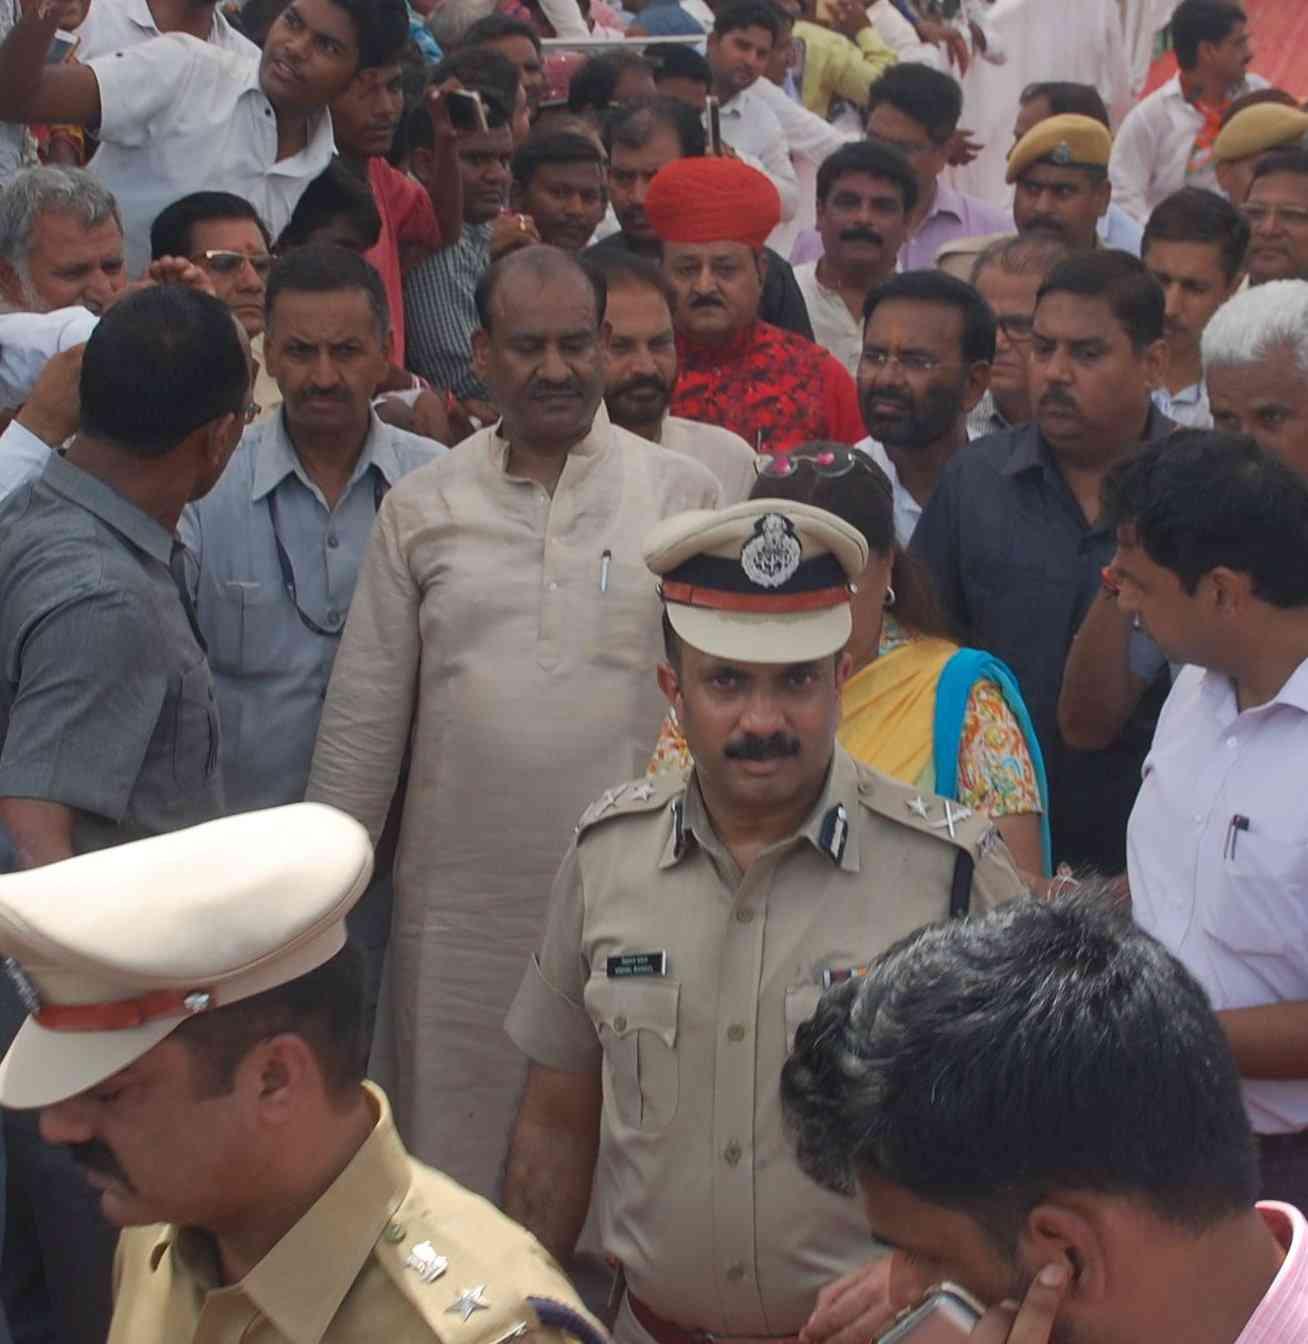 MP Om Birla Speek to CM Raje I can not fight elections